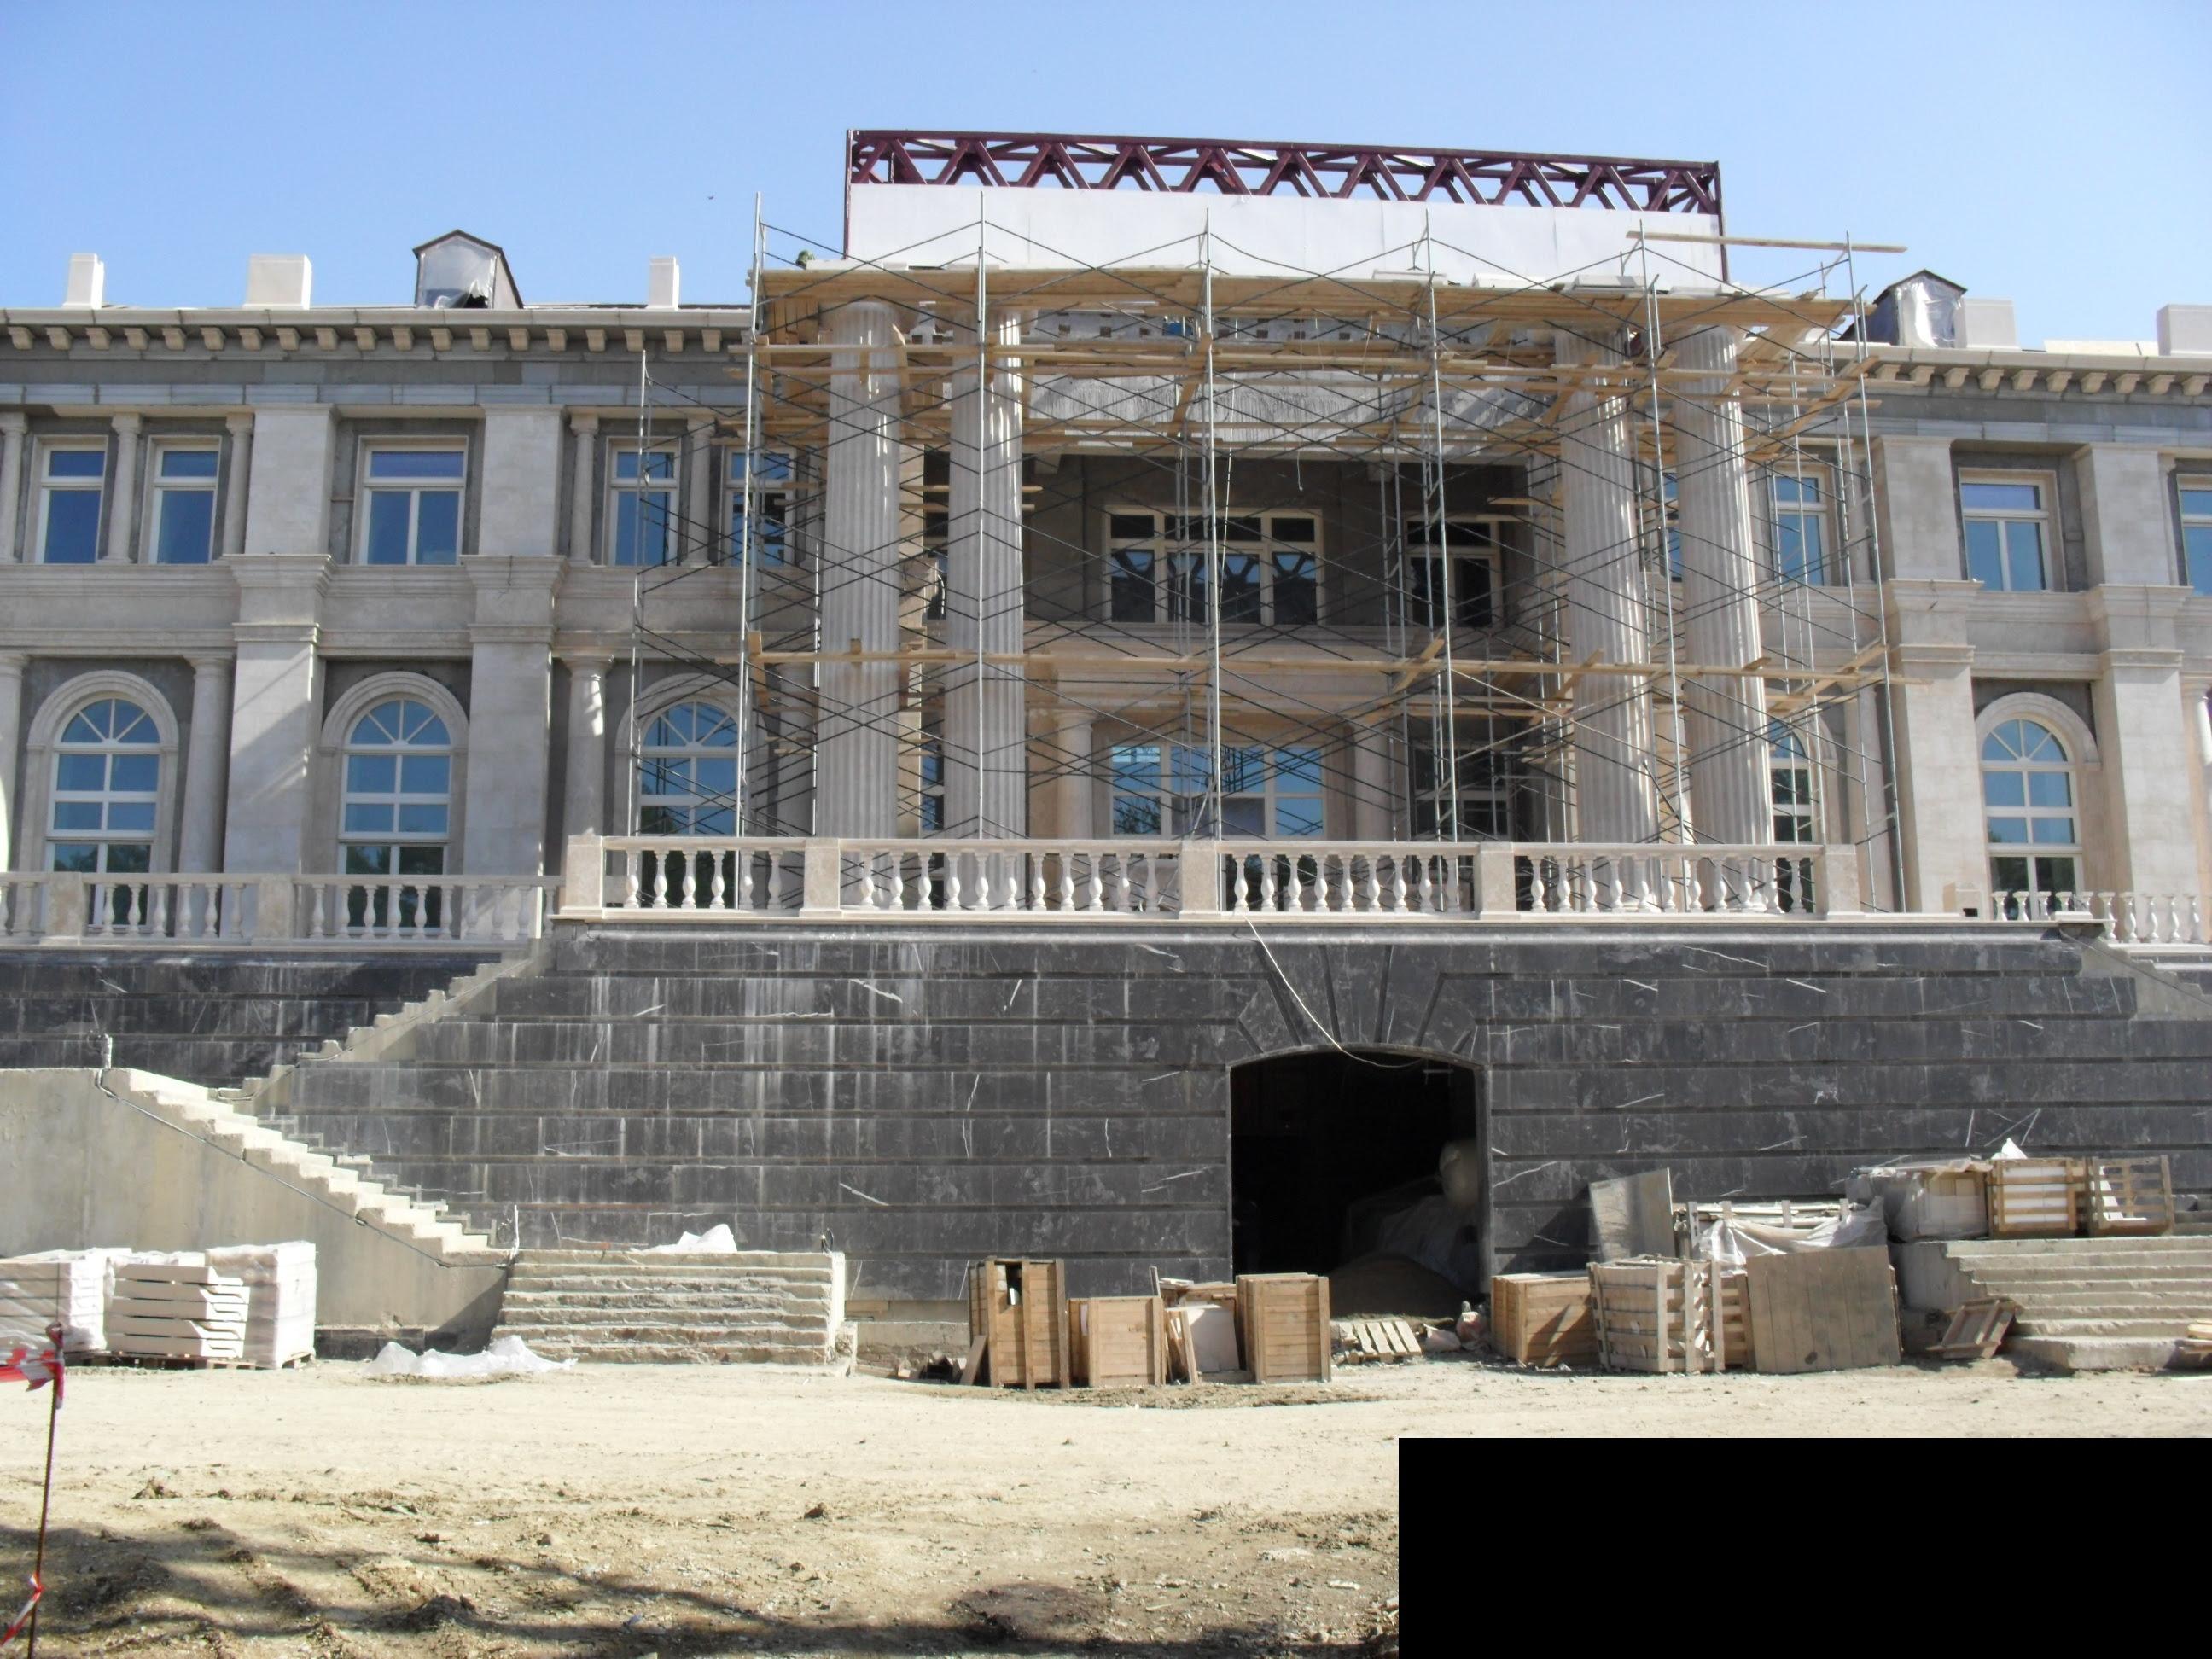 File:Putin palace construction.jpg